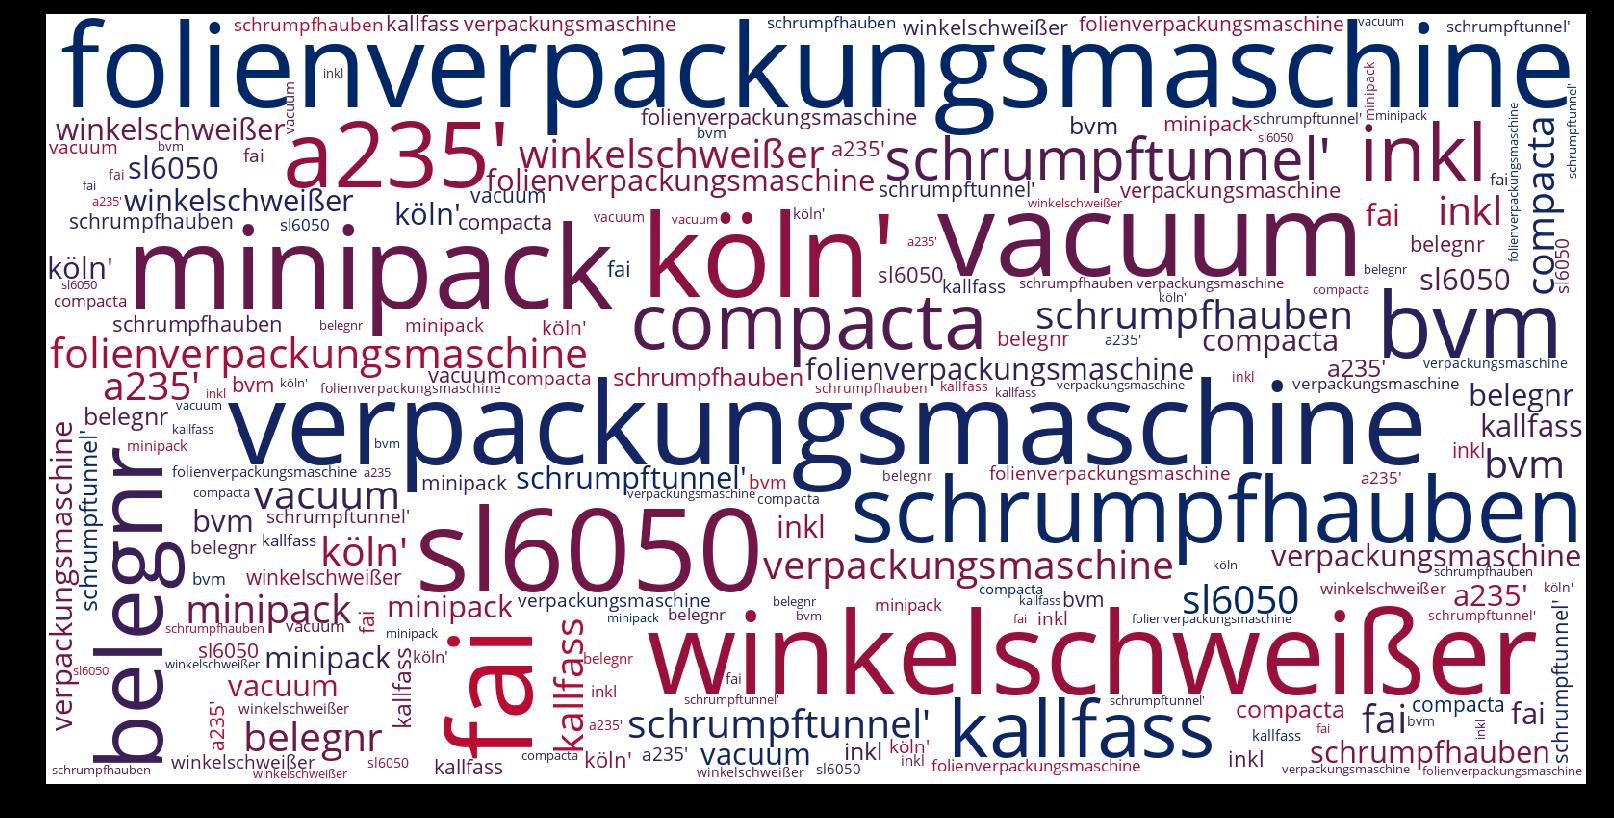 Folienverpackungsmaschine-wordcloud